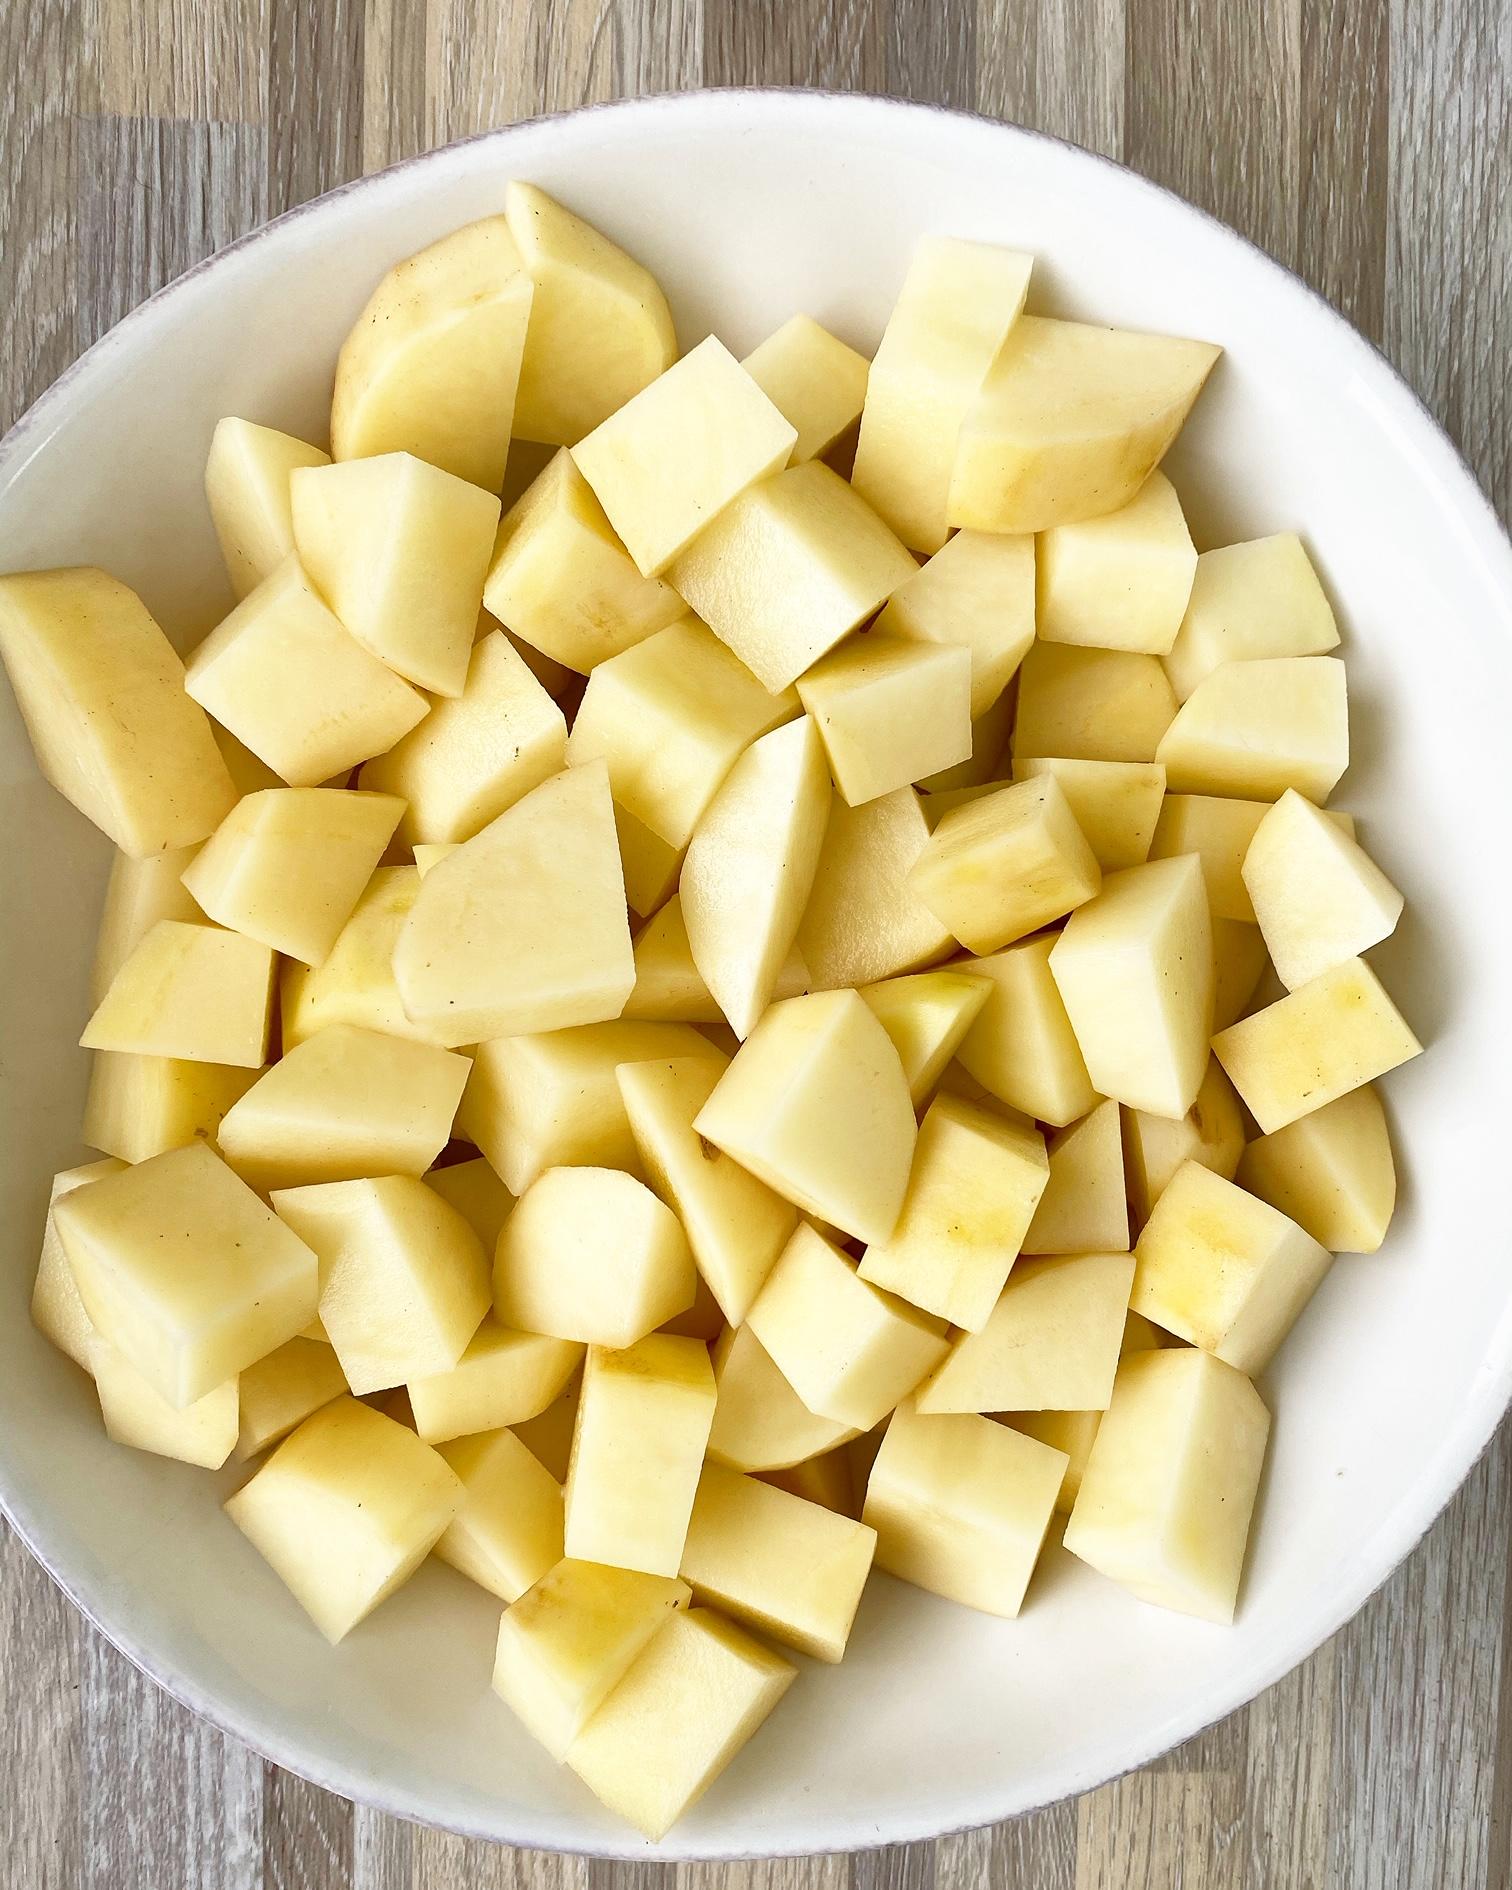 peeled & chopped russet potatoes